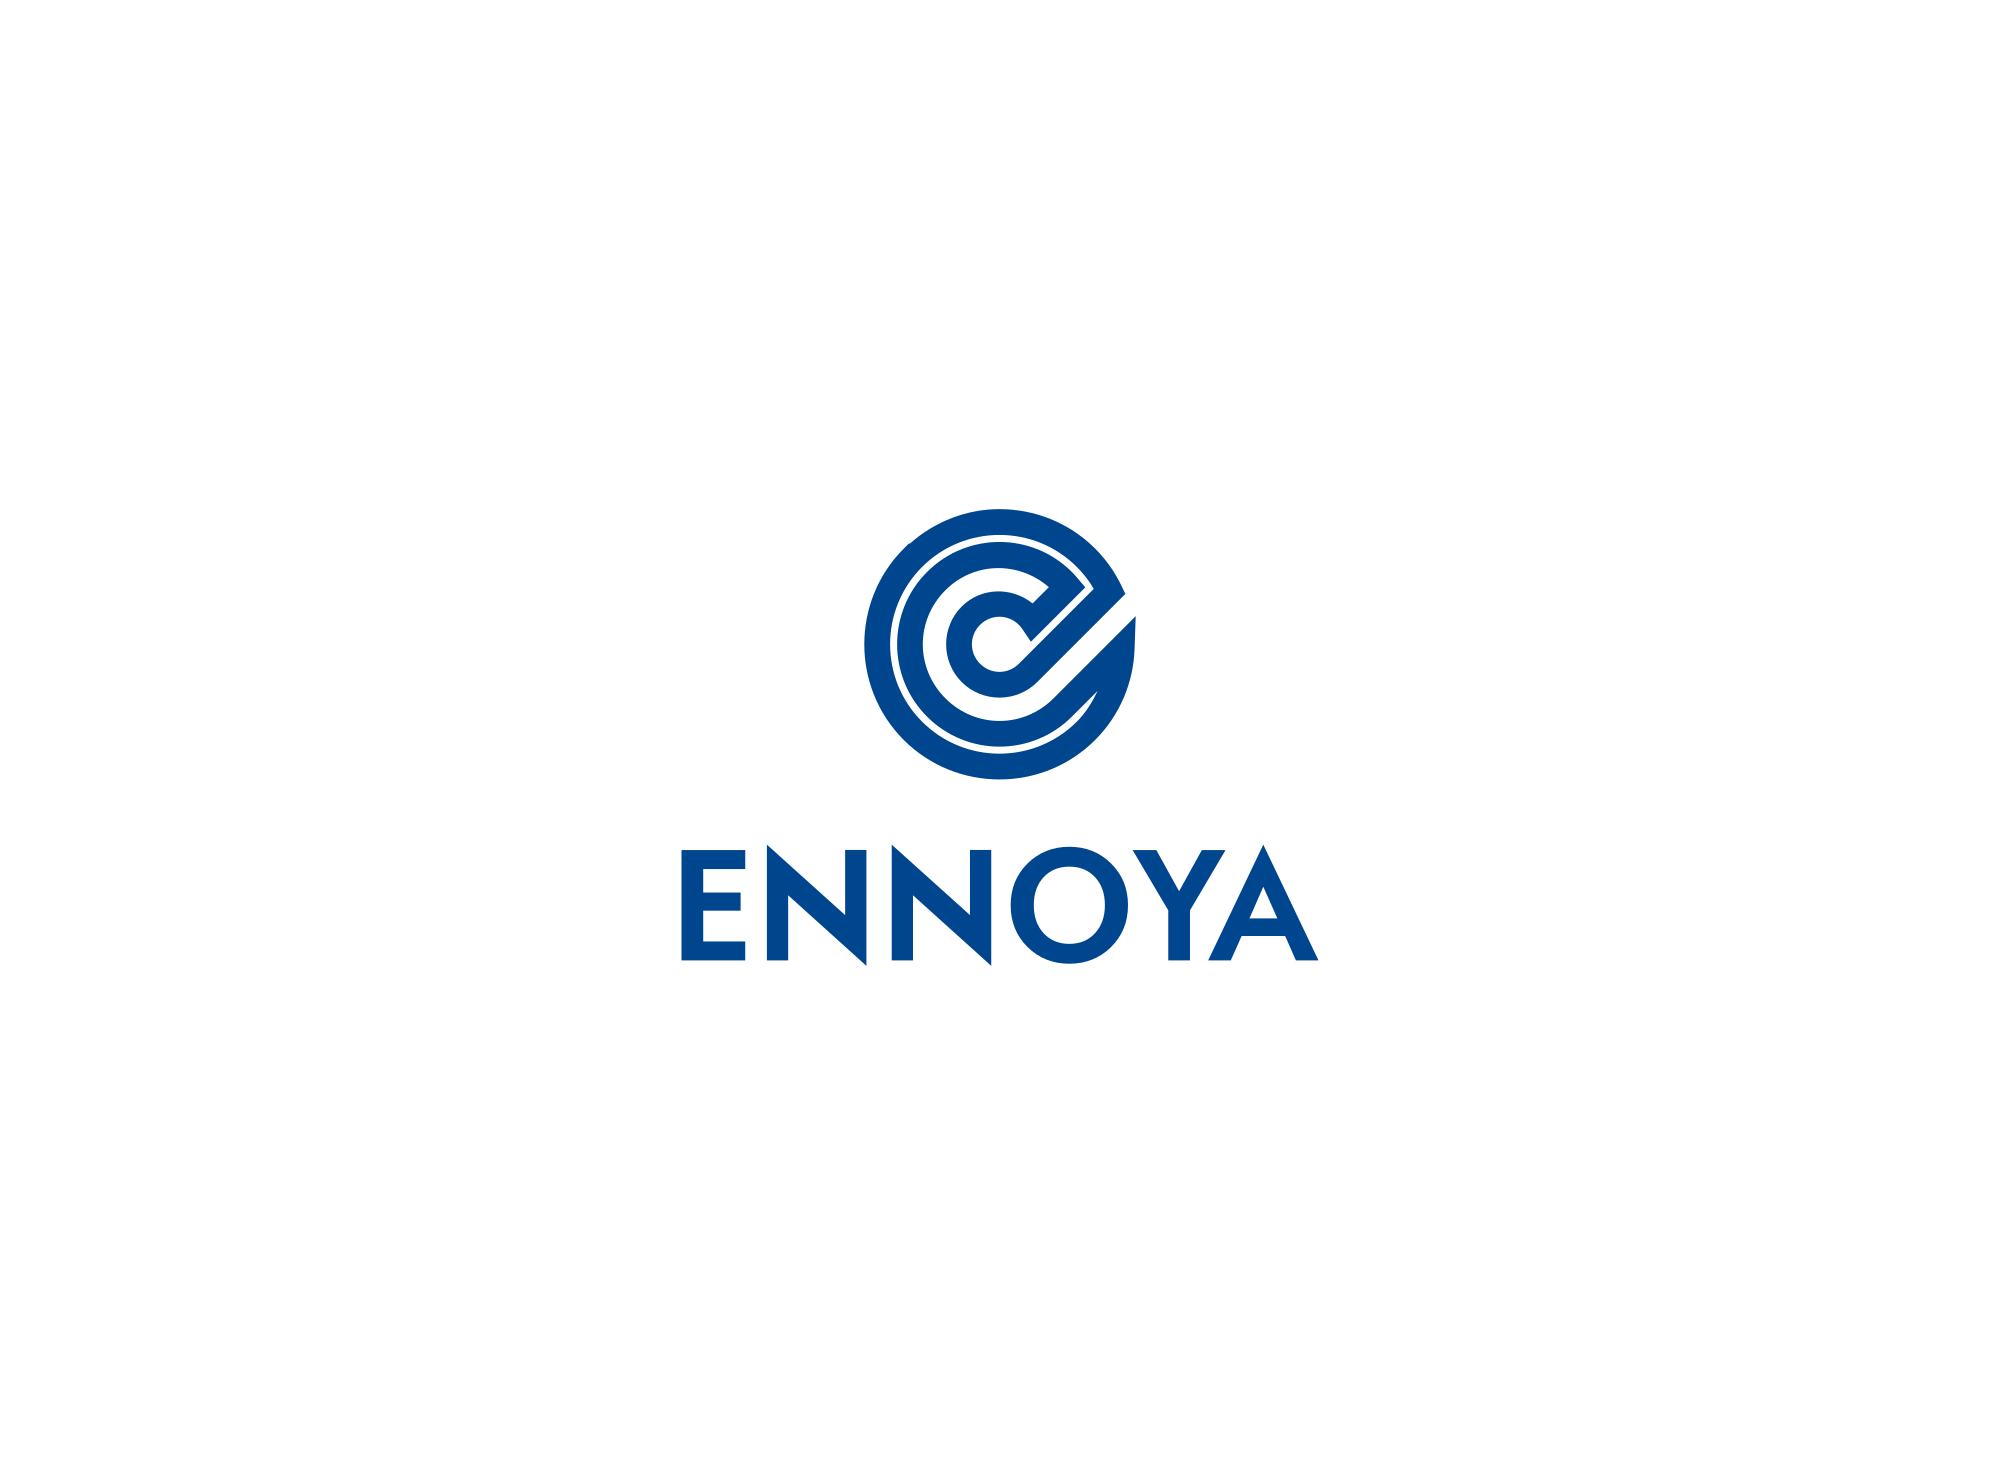 Логотип + фирменный стиль для продуктовой IT компании фото f_9415ad5f98e2e1ff.png